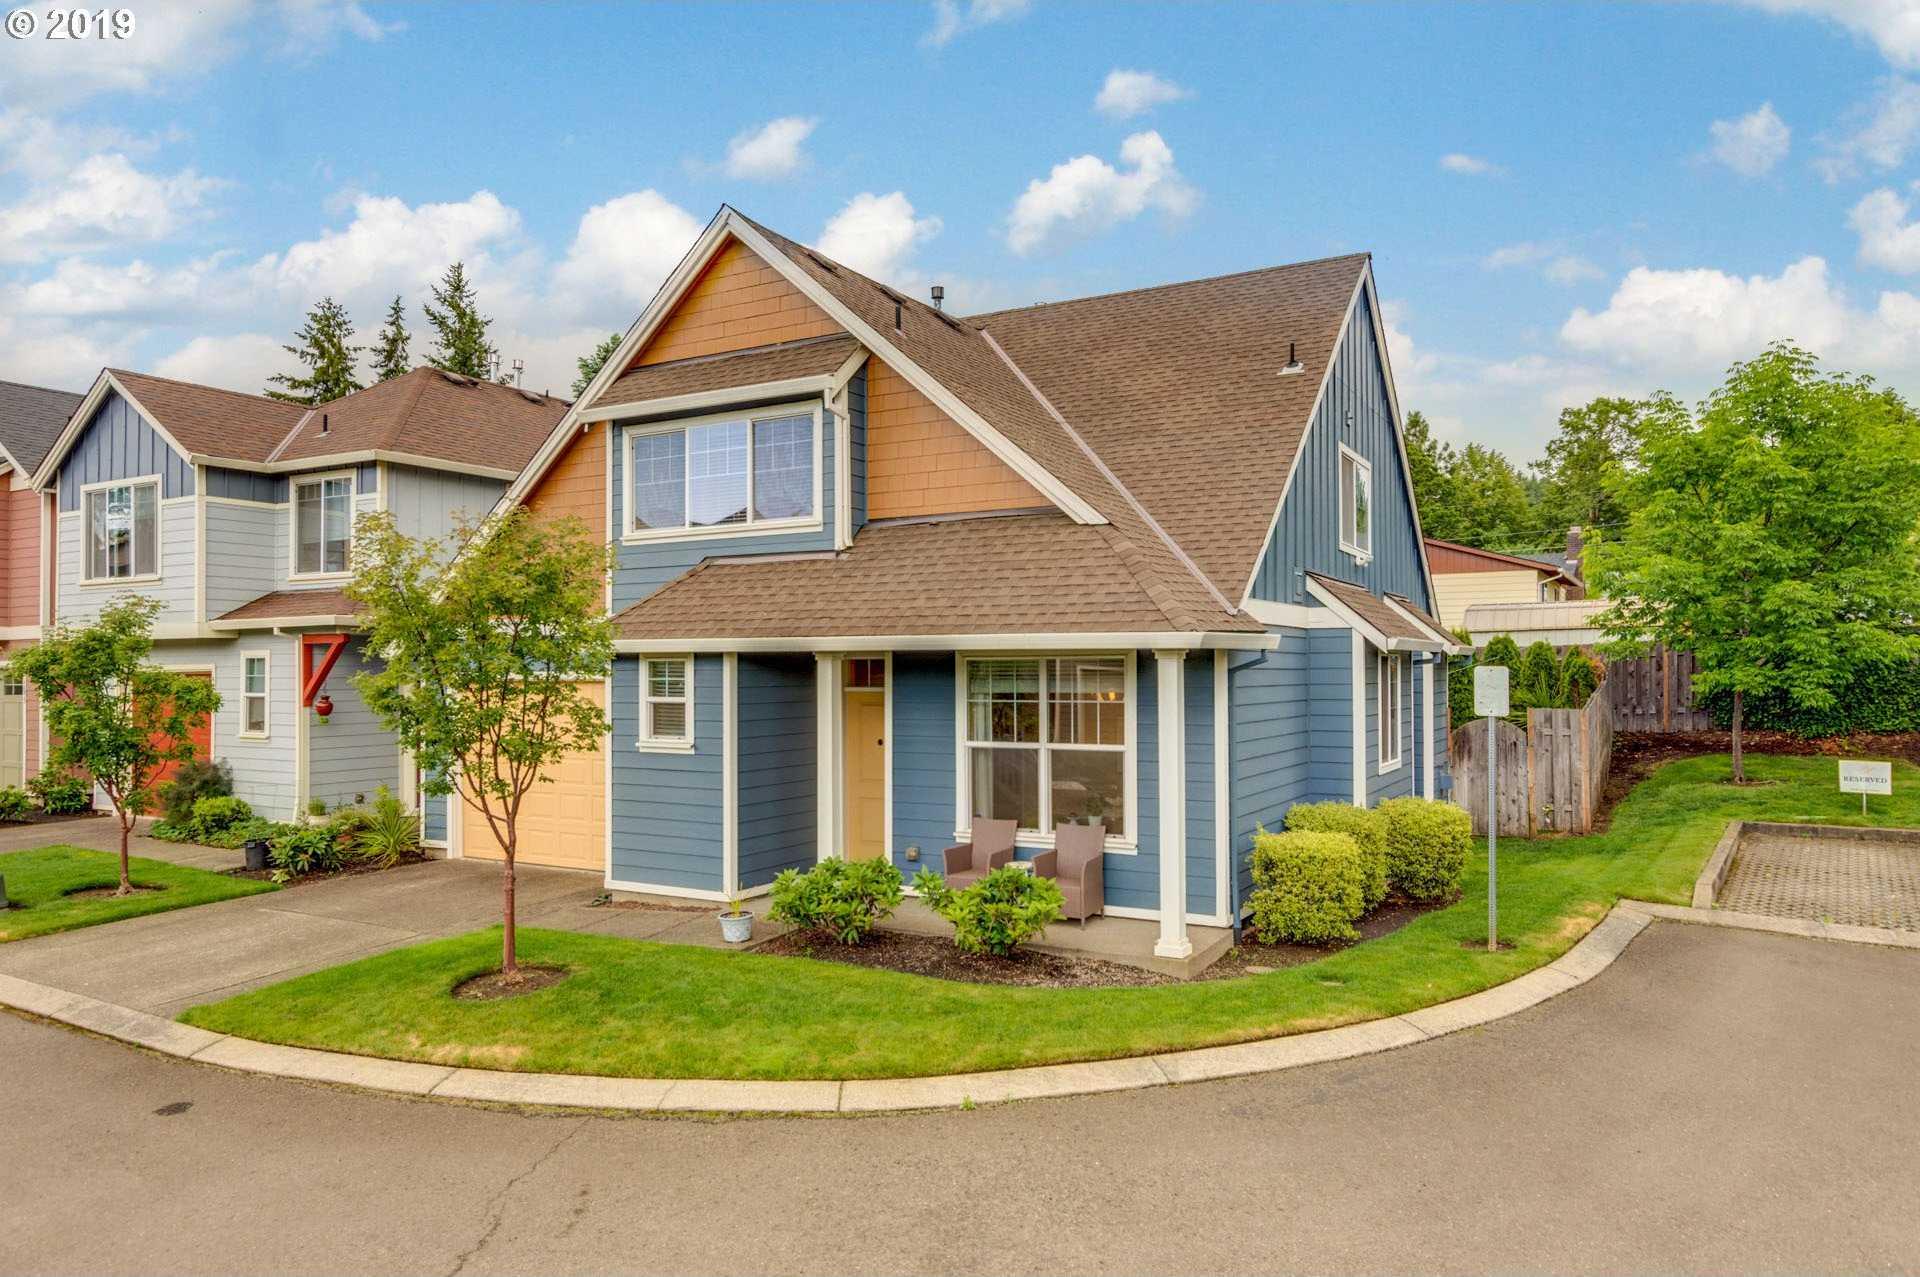 $399,000 - 3Br/3Ba -  for Sale in Jennings Lodge, Milwaukie